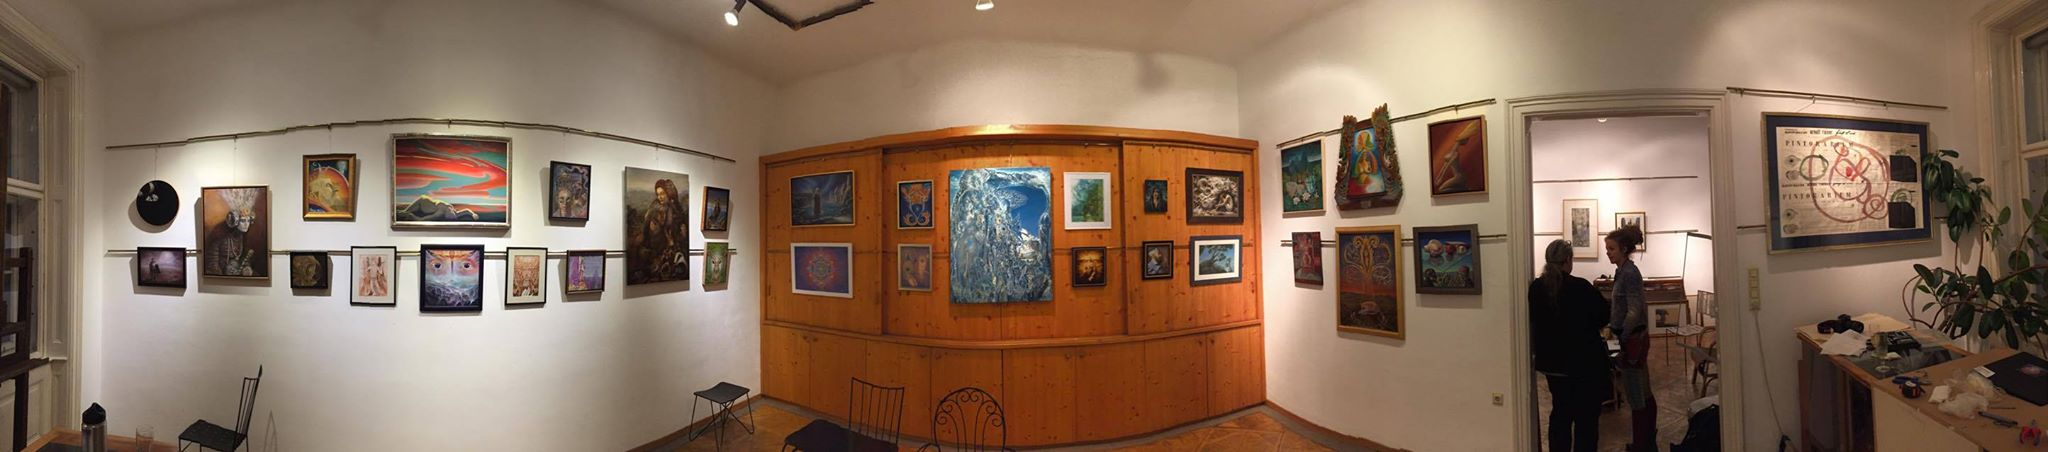 """Transmission"" Exhibition - Galerie 10"